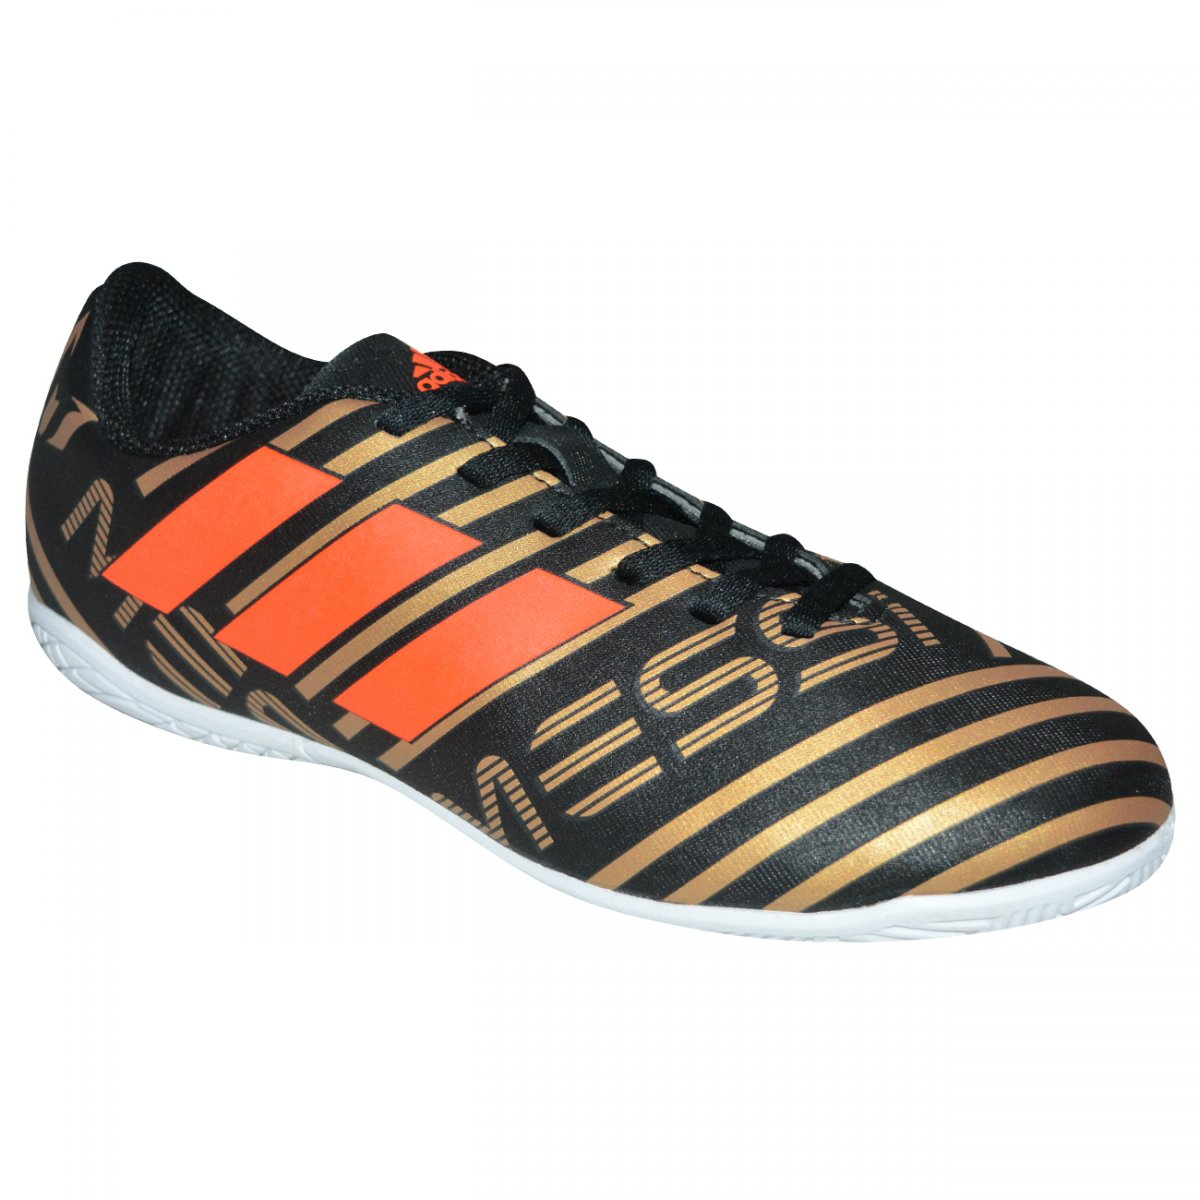 519bfc0bba0b3 Tenis Adidas Nemeziz Messi Tango 17.4 Juvenil CP9224 -  Preto dourado laranja - Chuteira Nike